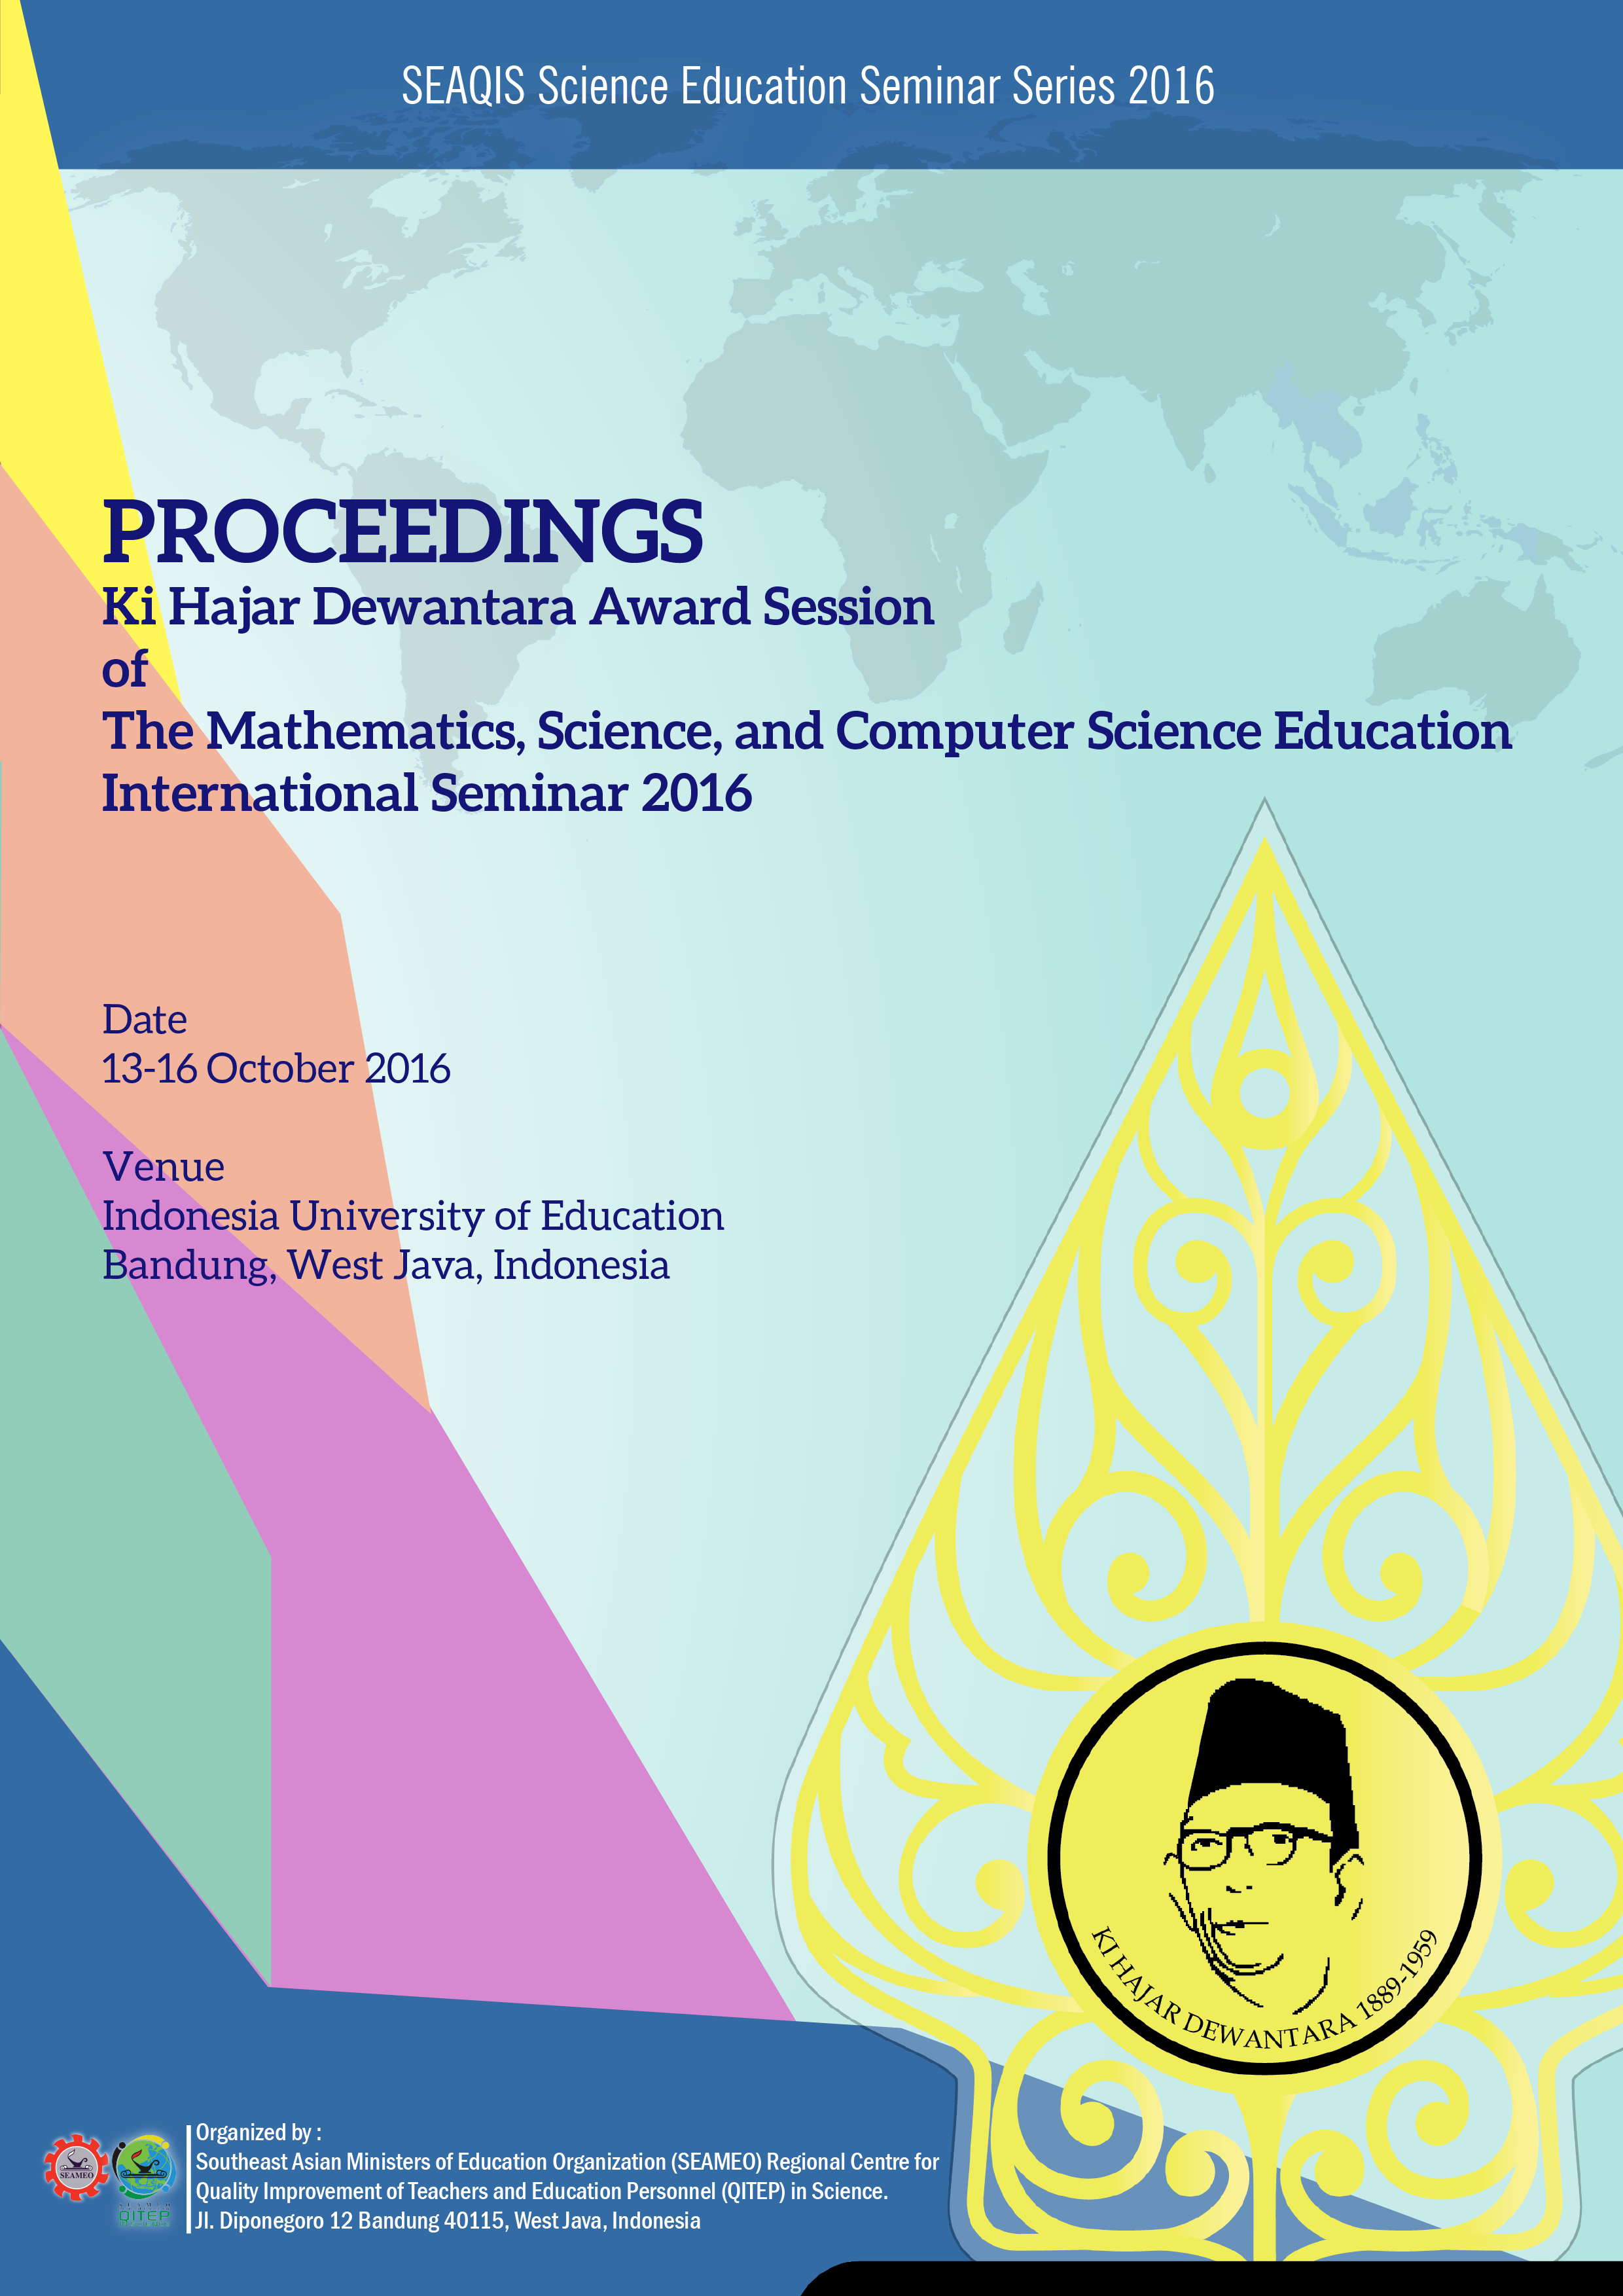 Proceeding Ki Hajar Dewantara Award Session of The Mathematics, Science, and Computer Science Education International Seminars 2016